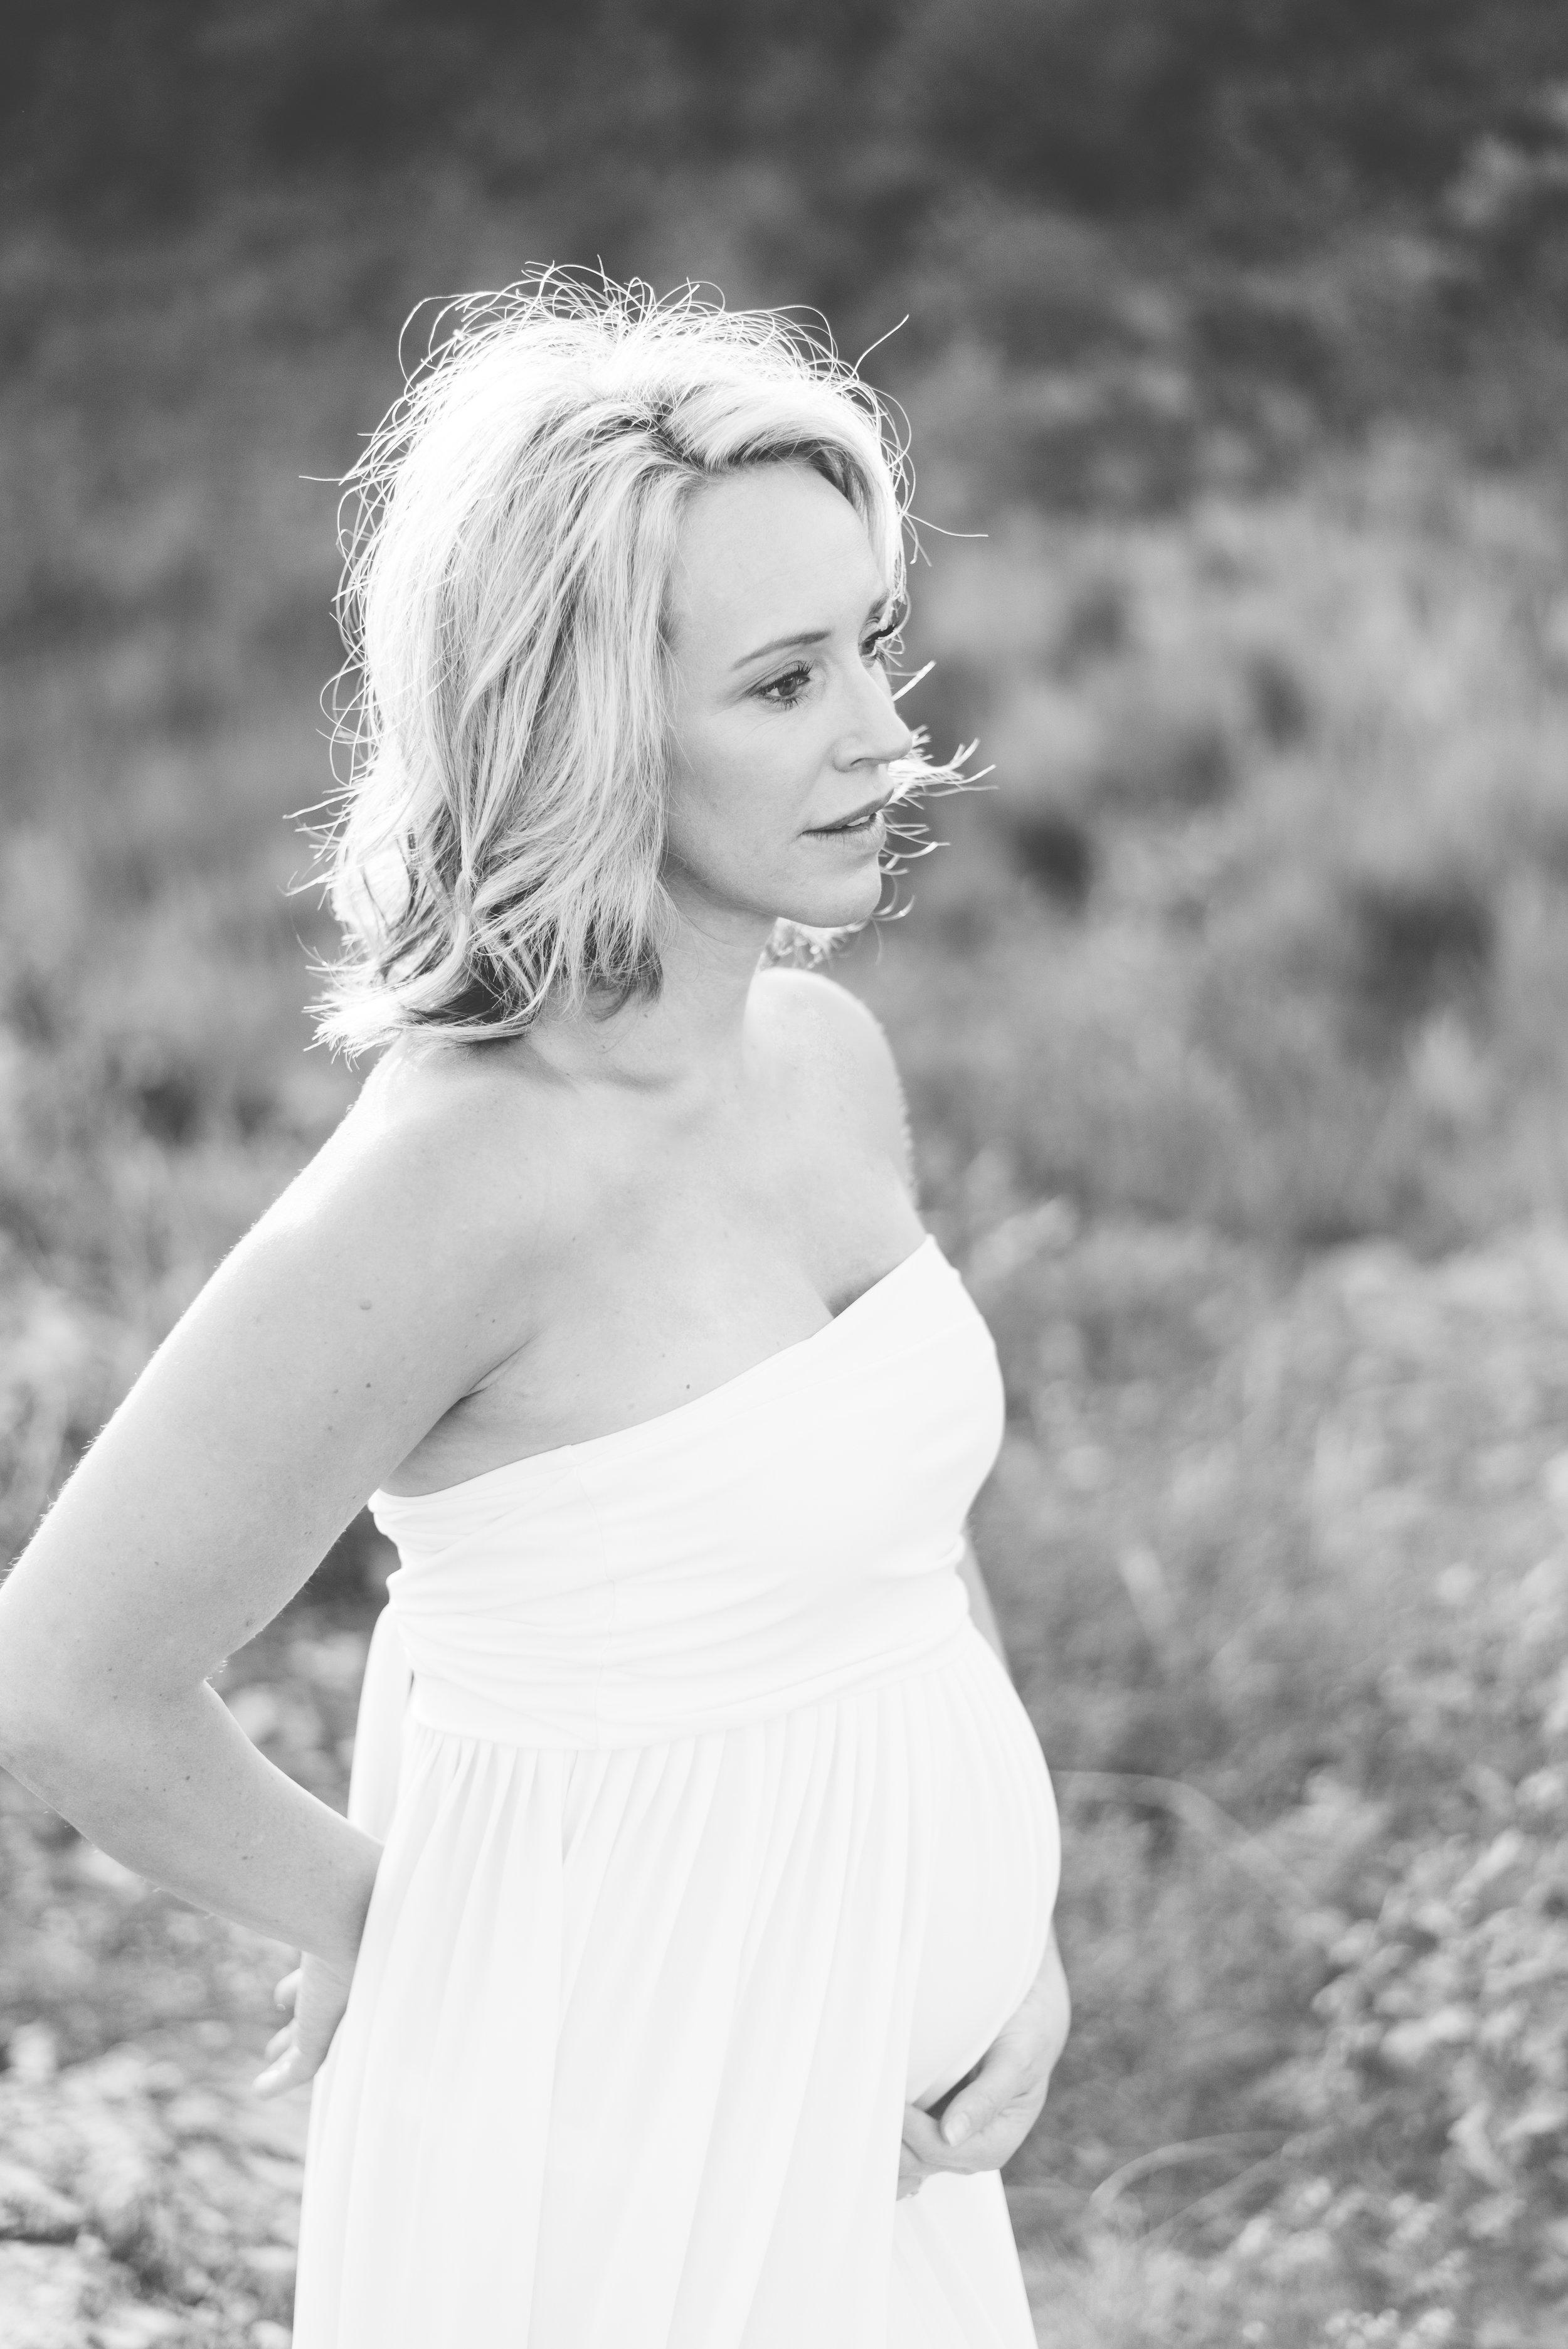 Caroline's_Maternity_Photos83459.jpg